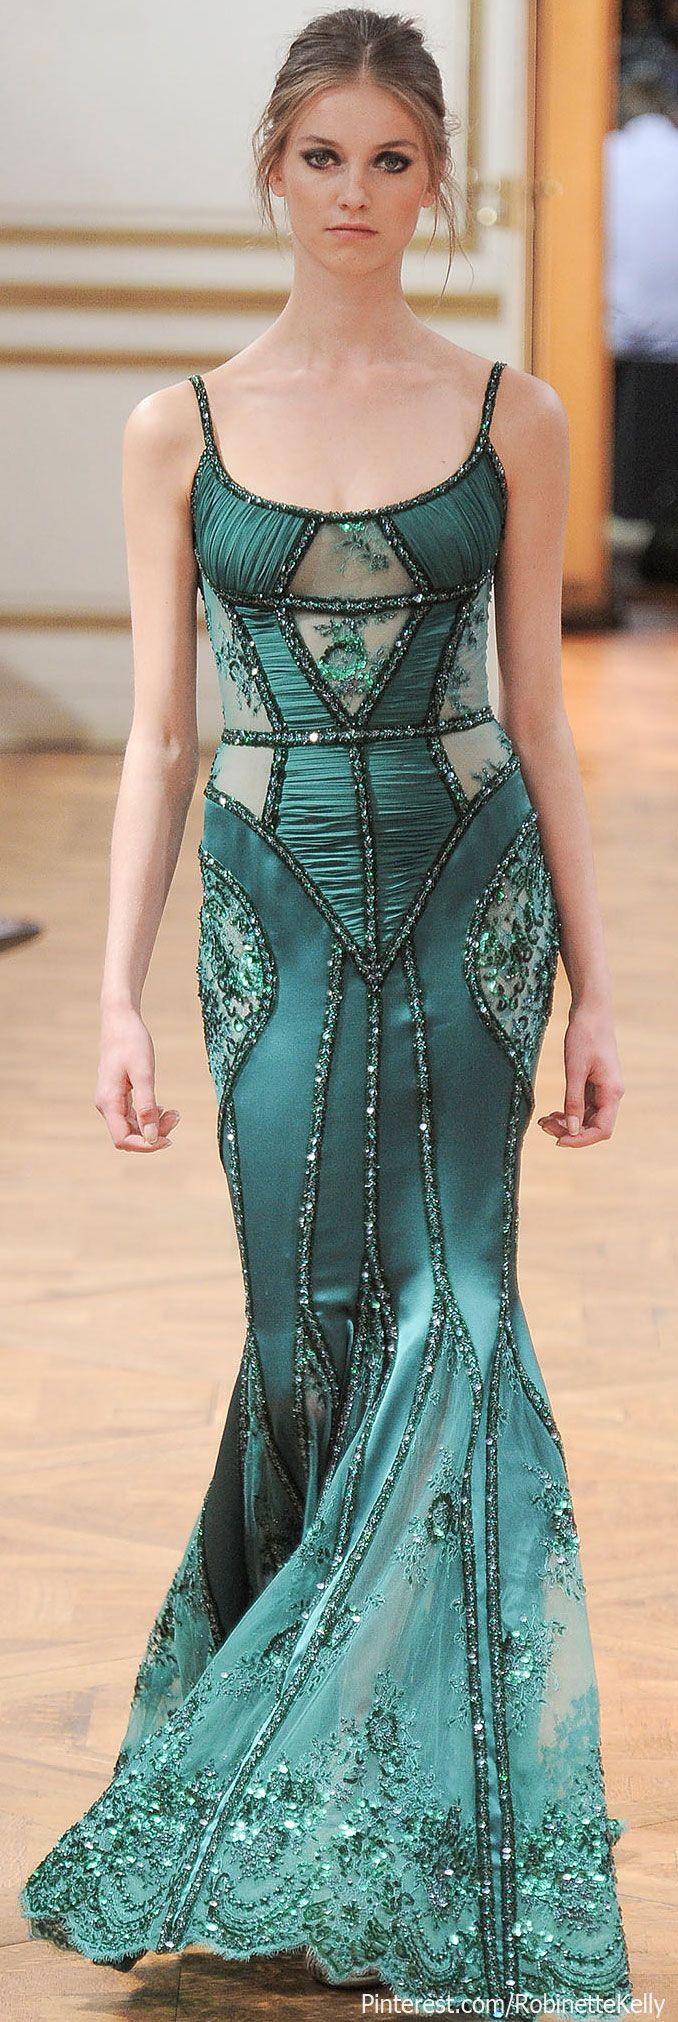 Zuhair Murad Haute Couture | F/W 2013